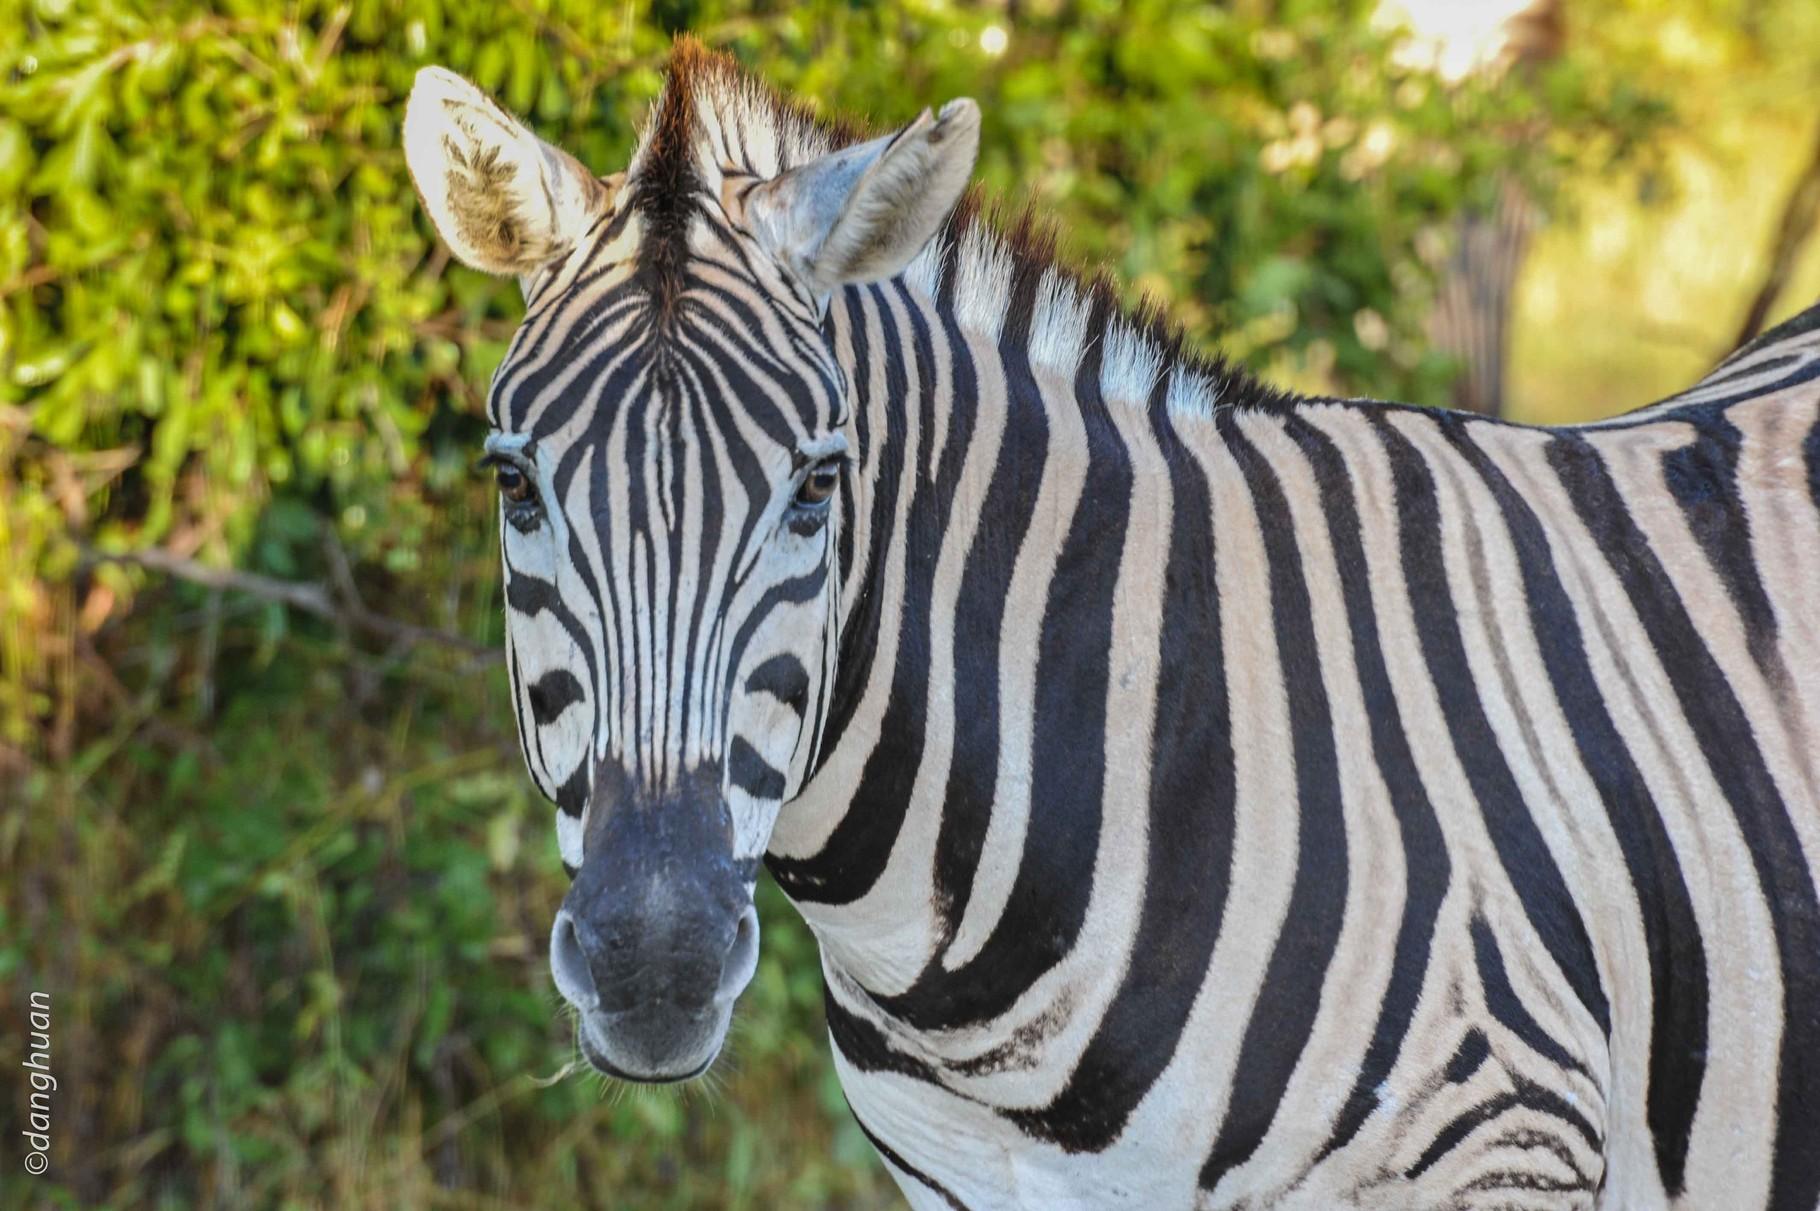 Zèbre (parc national d'Estosha - Namibie)